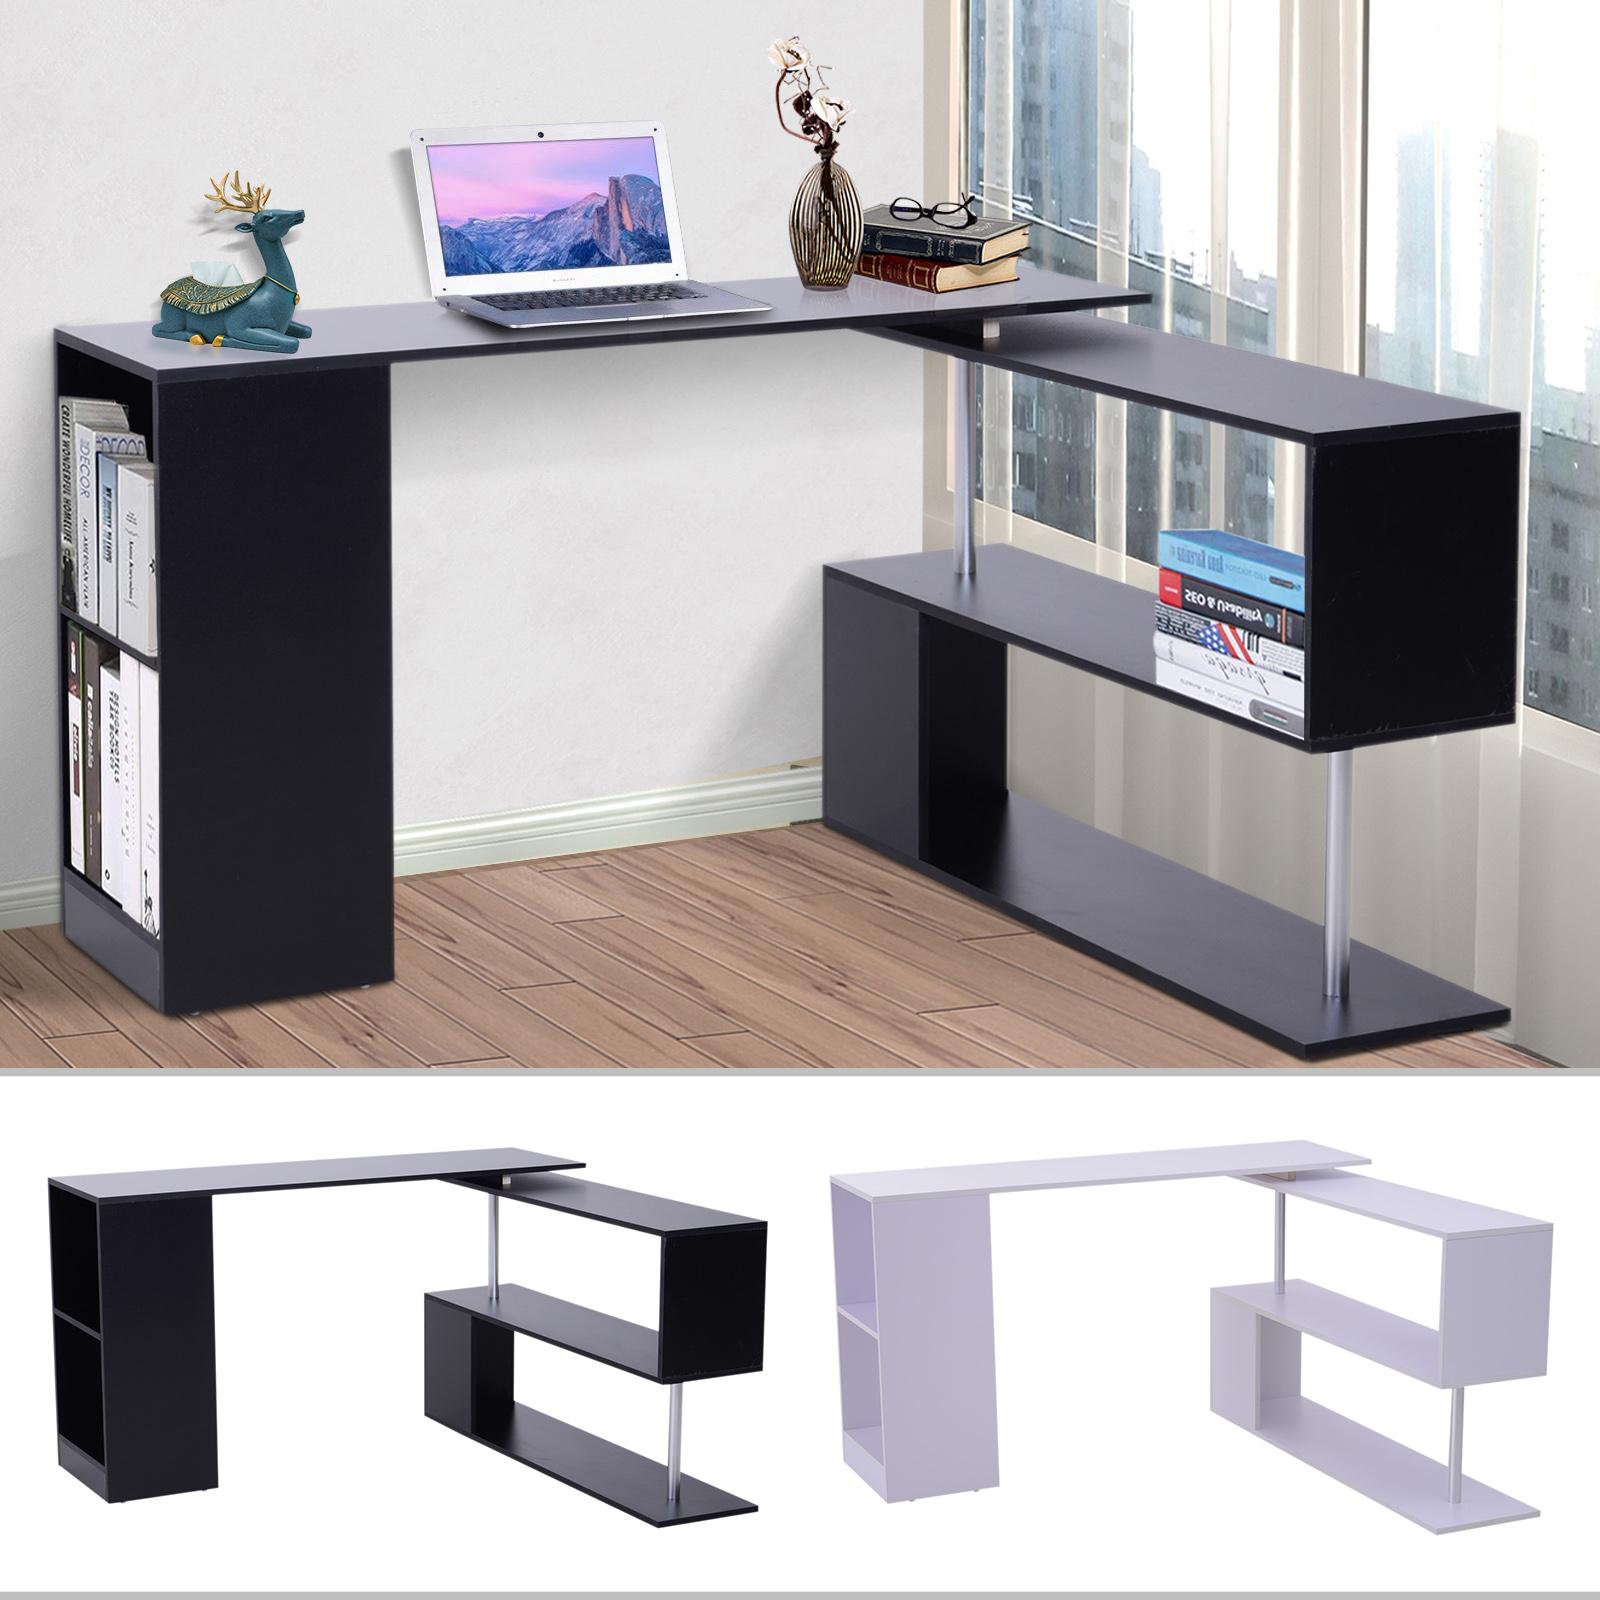 360 Rotating Corner Desk Storage Shelf Combo Workstation L Shaped Table Office Ebay